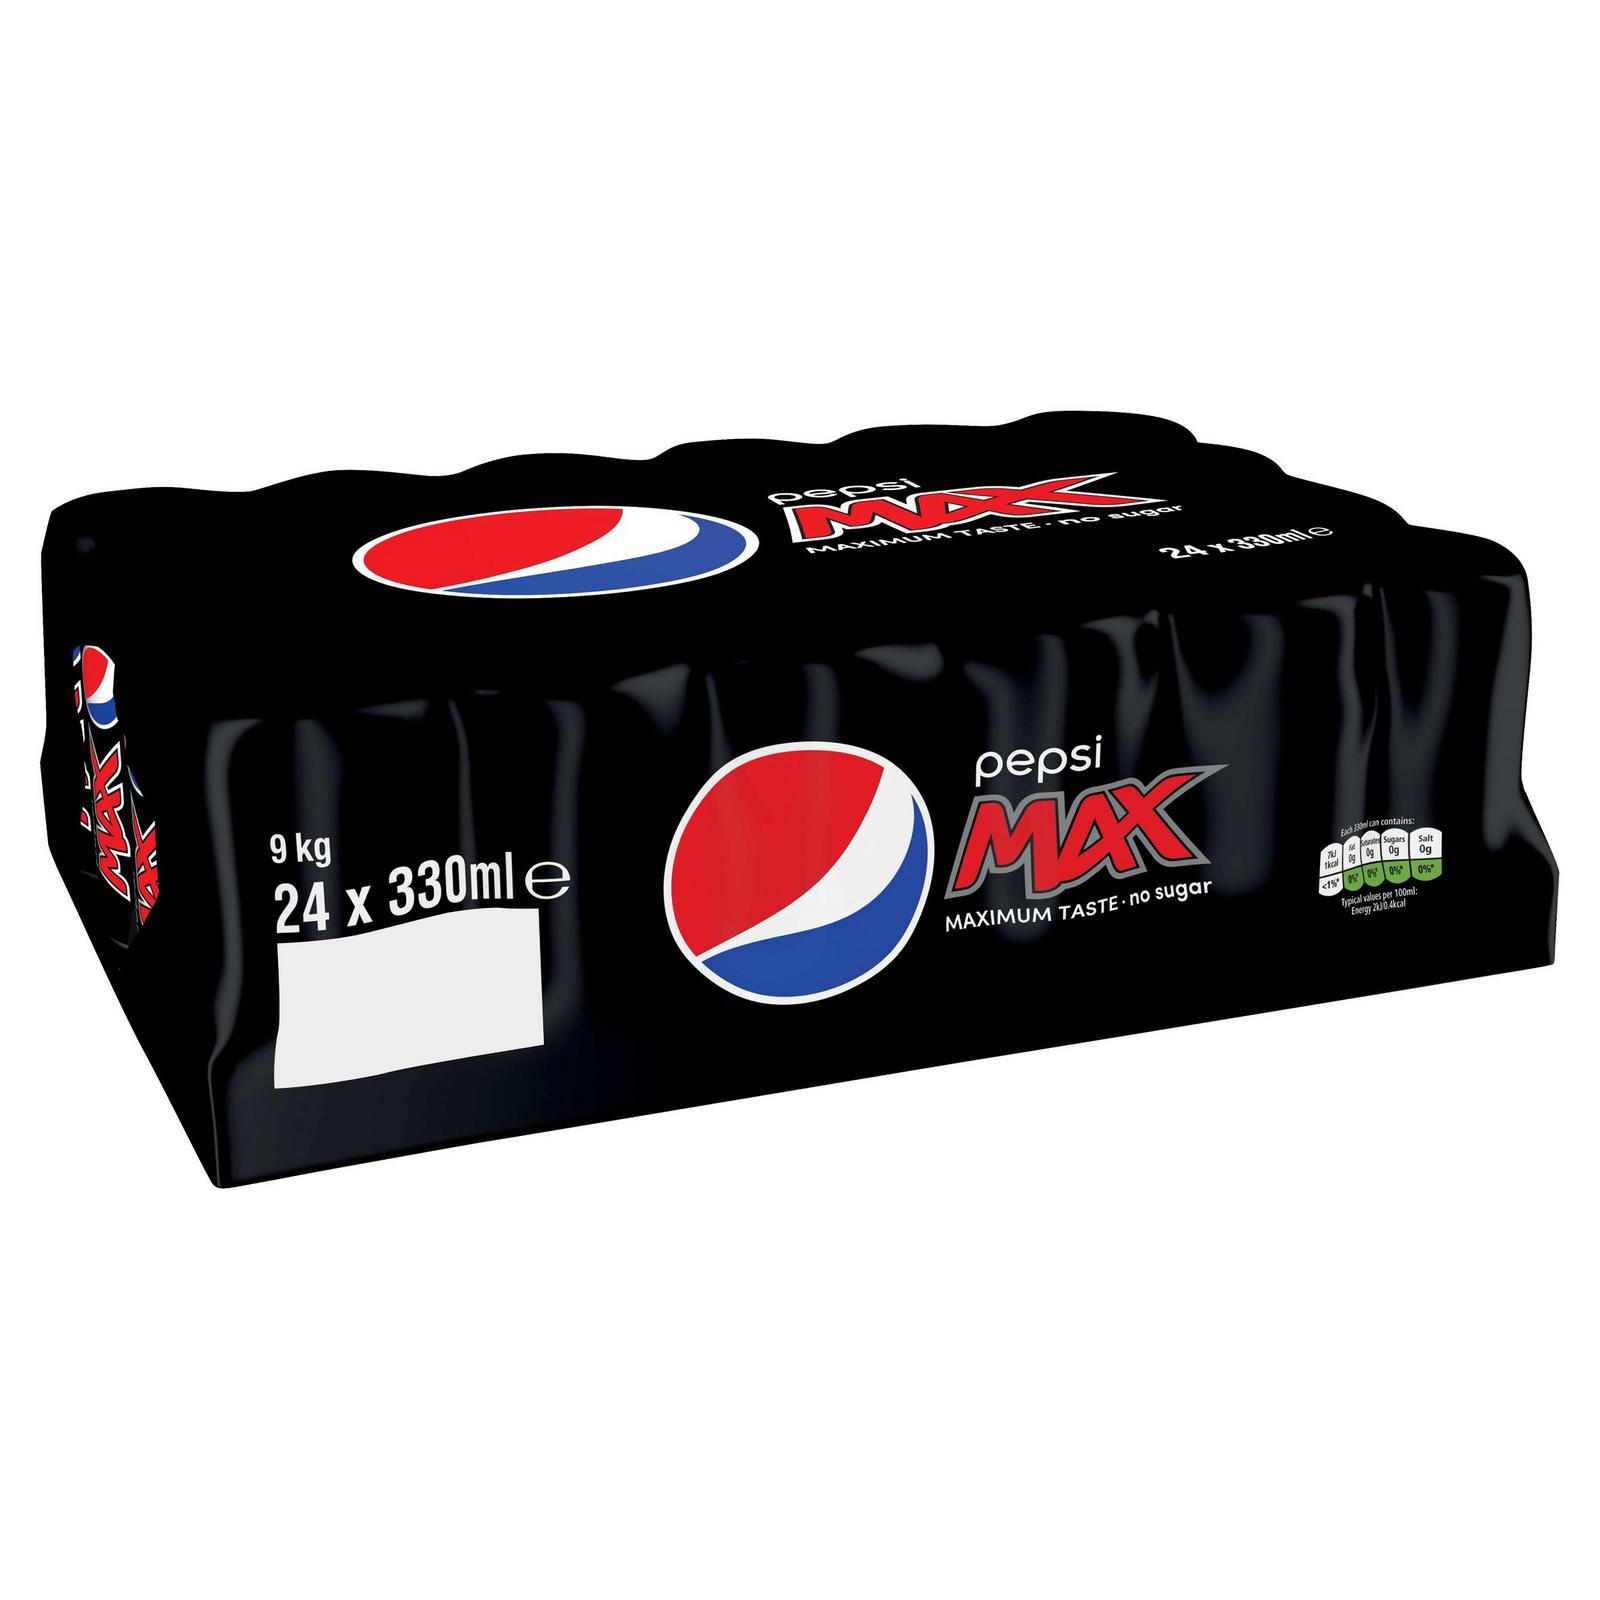 72 Cans Diet Coke, Coca-Cola Zero, Cherry Cola, Pepsi Max, 7UP, Fanta & Irn Bru £19 @ Iceland